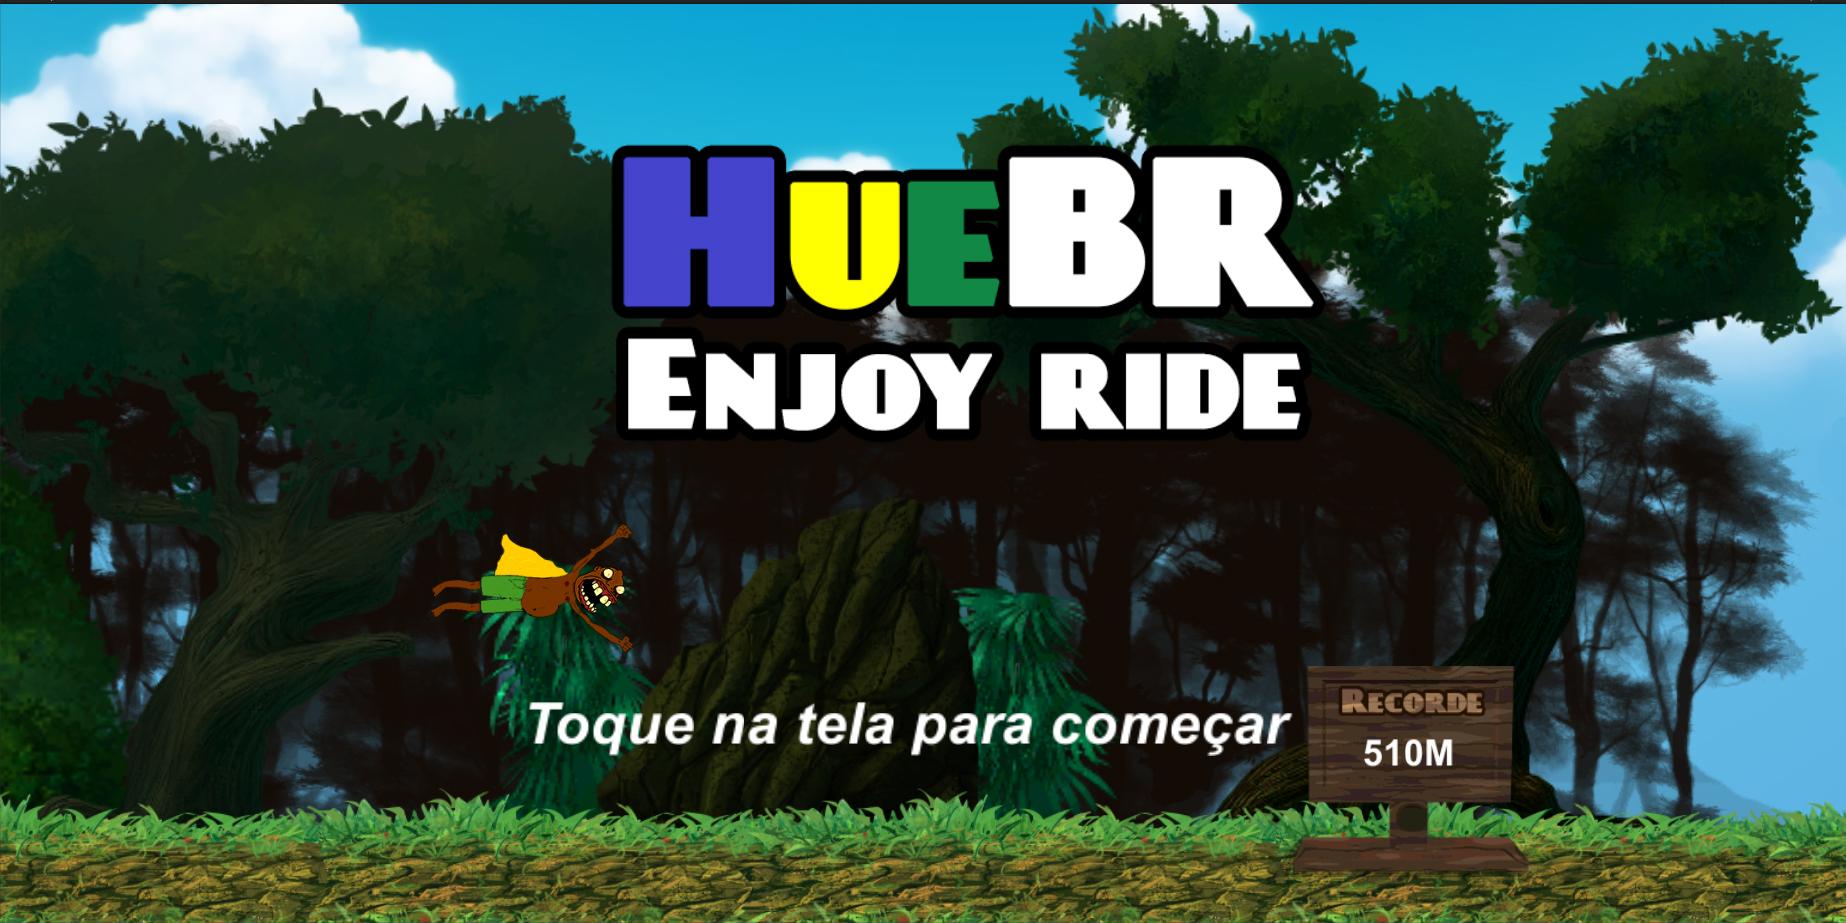 Hue BR Enjoy Ride